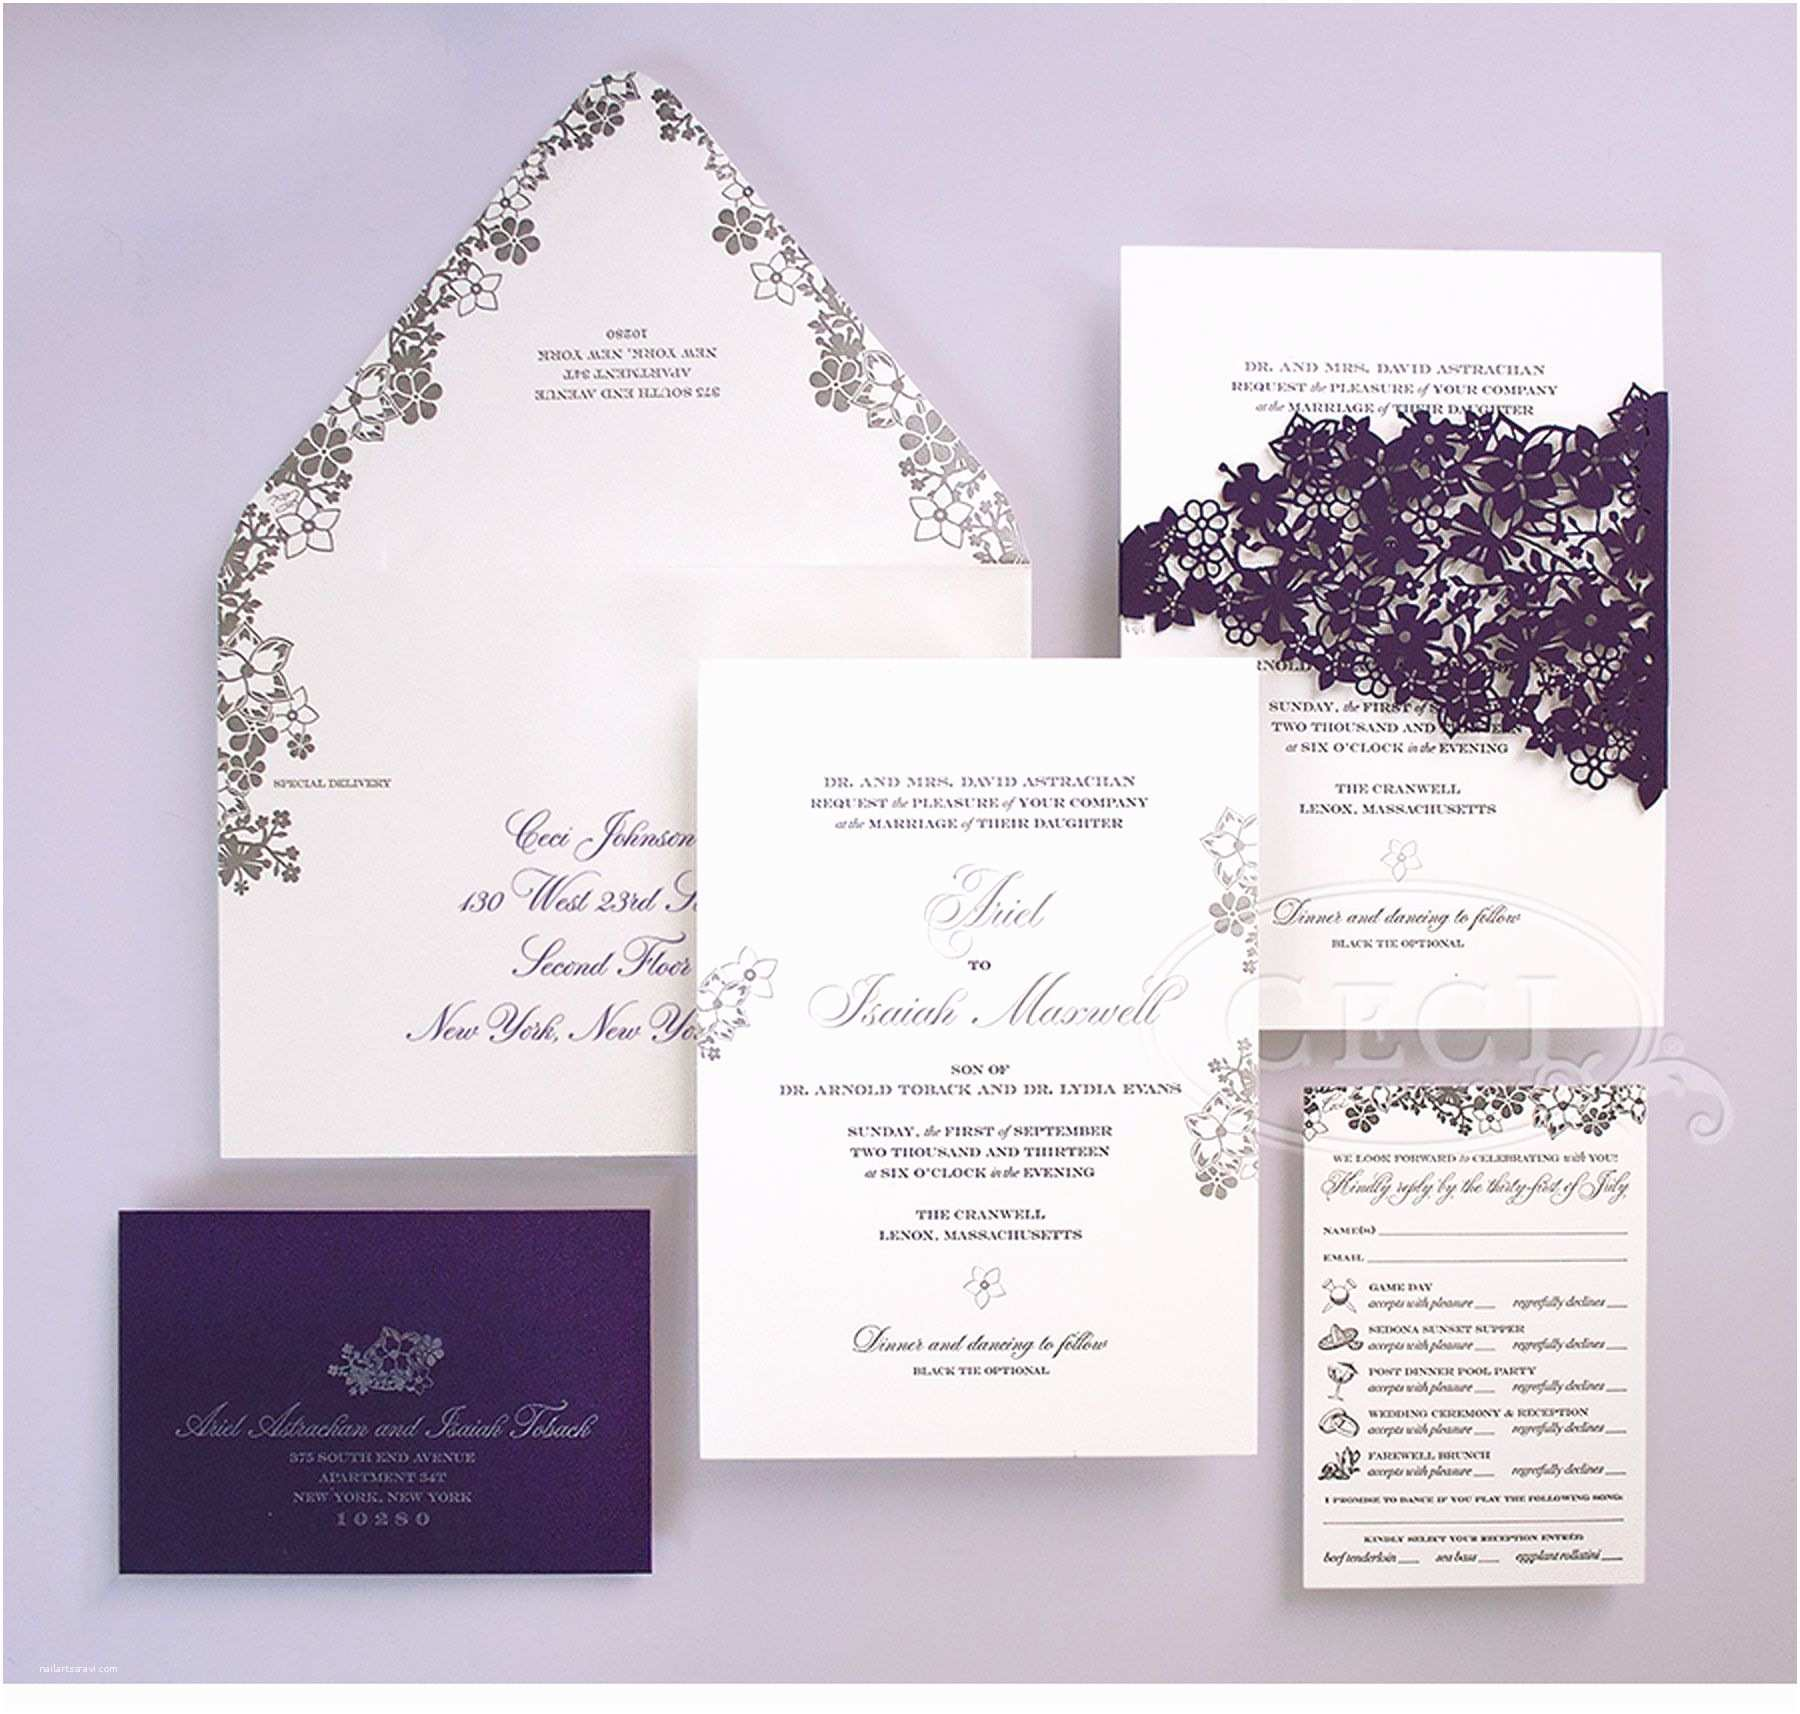 New York Wedding Invitations Luxury Wedding Invitations by Ceci New York Our Muse